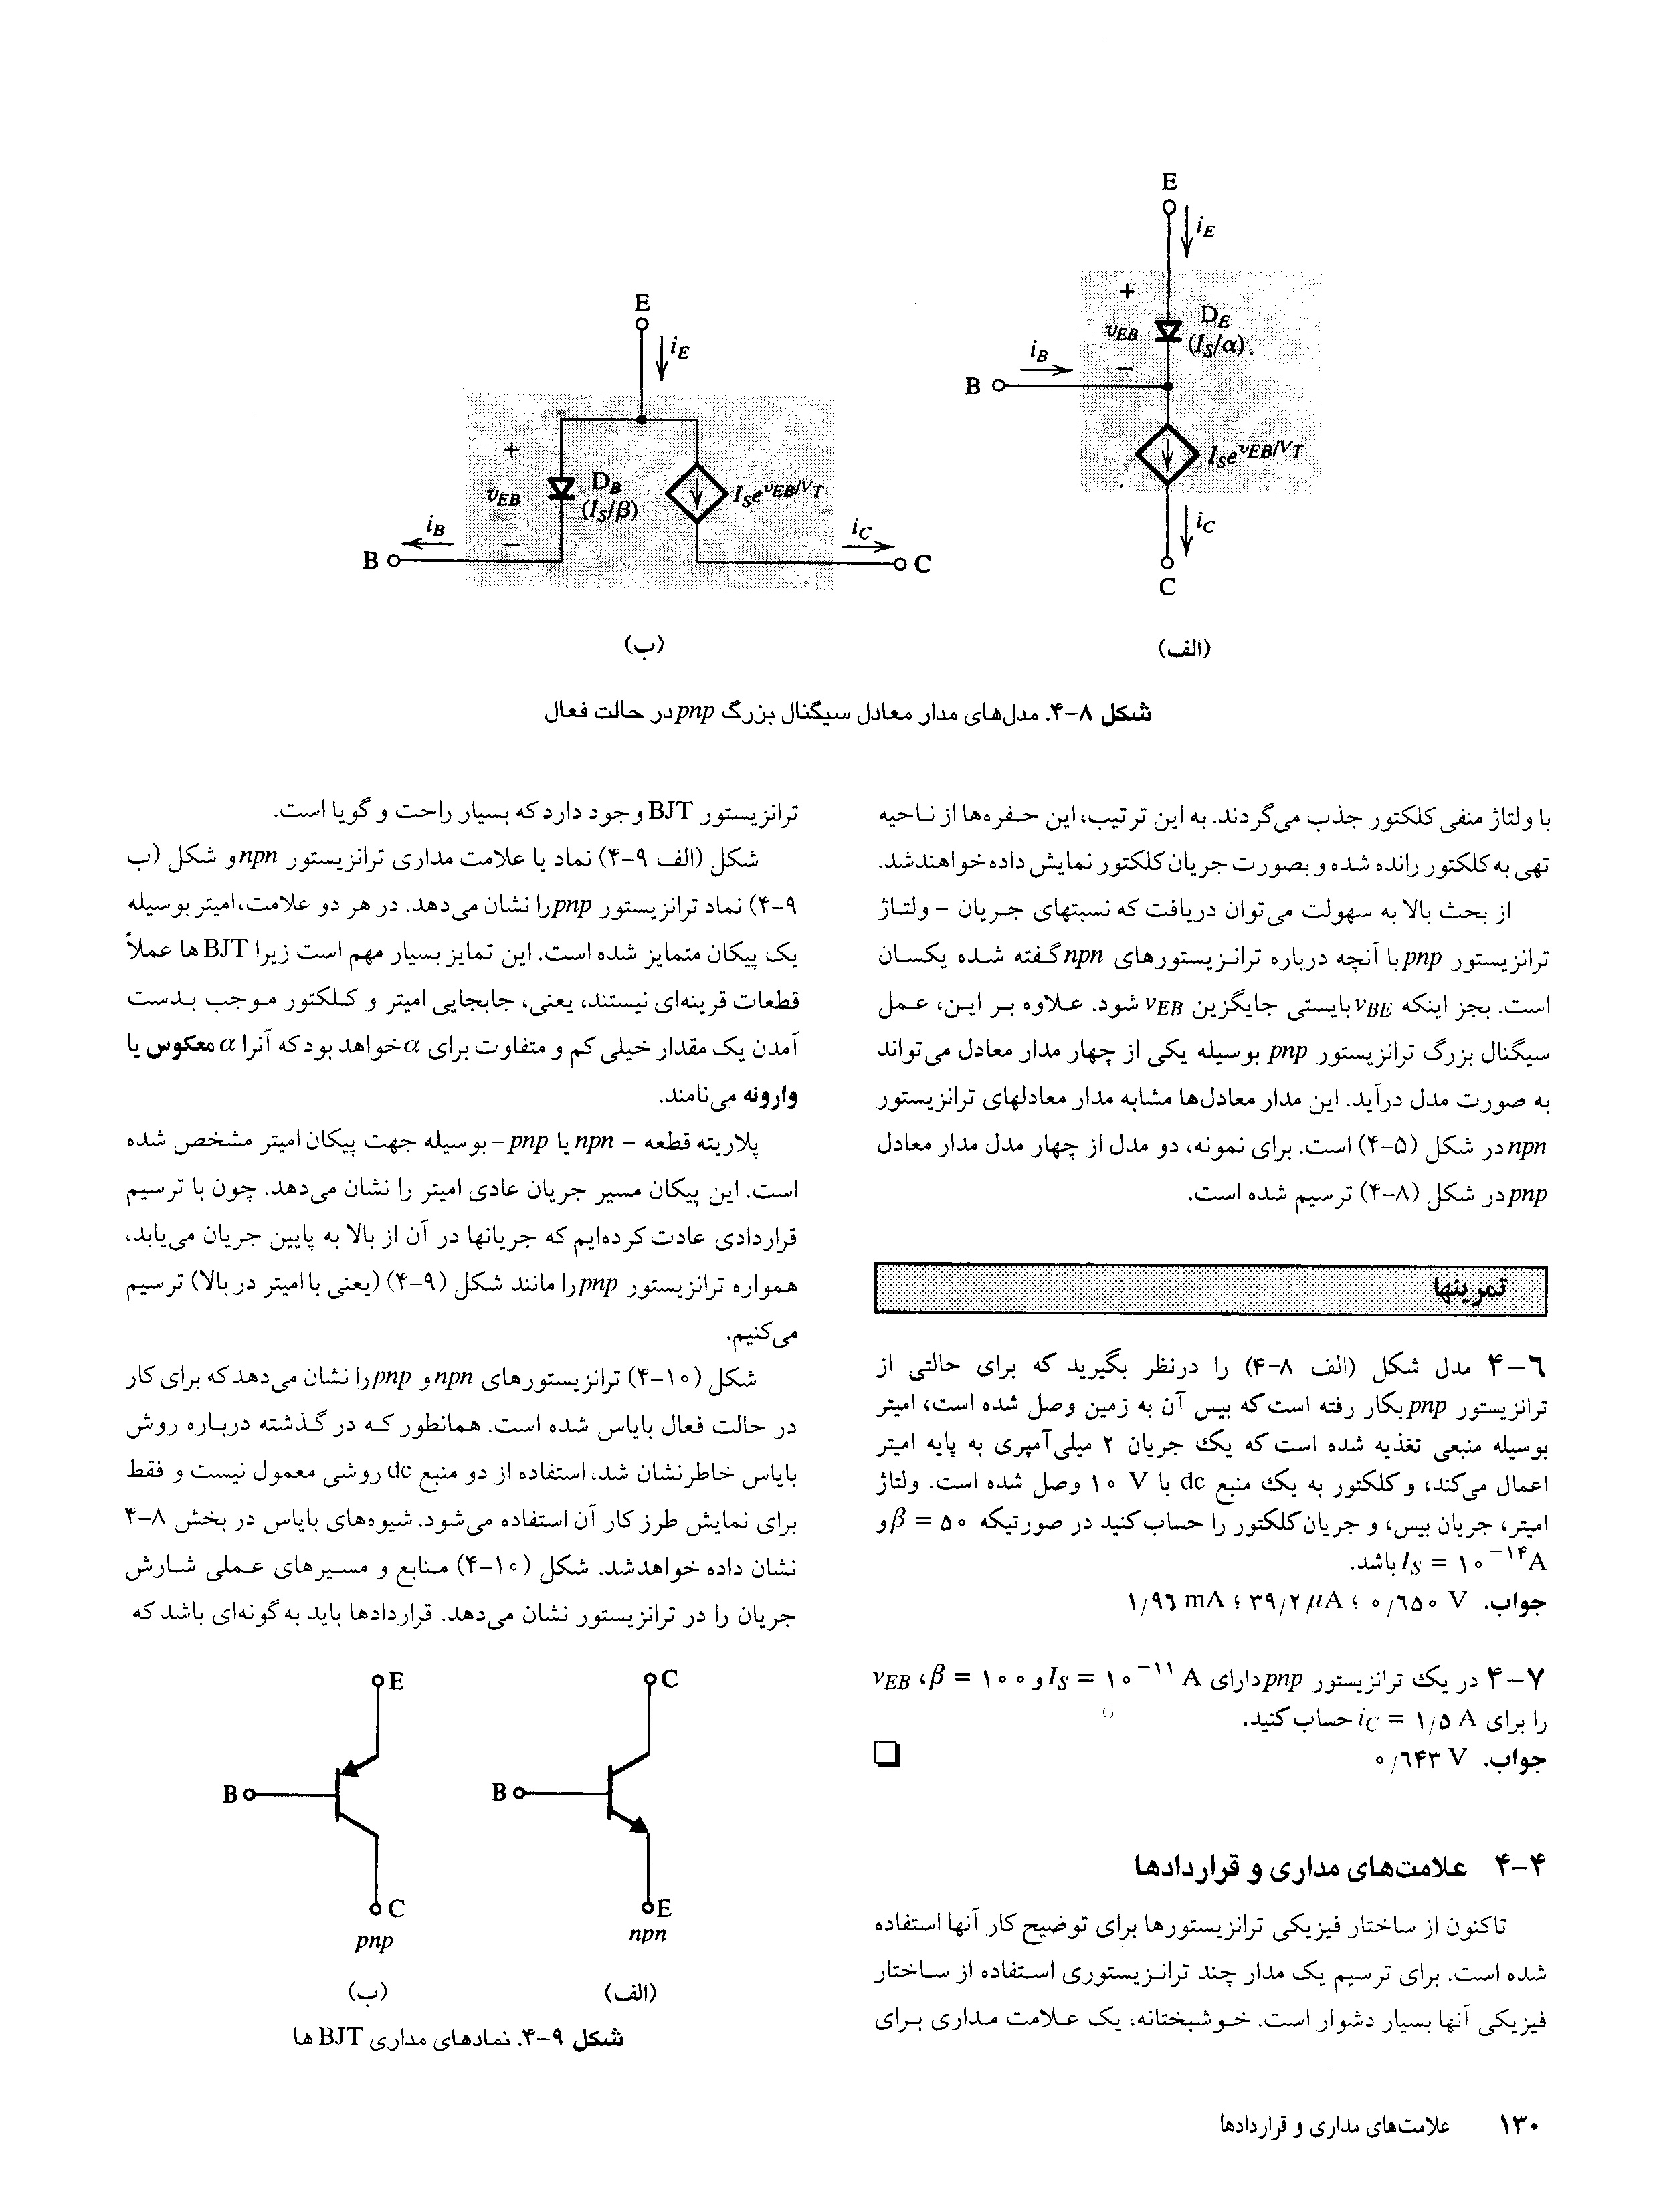 کتاب میکرو الکترونیک 1 سدرا اسمیت